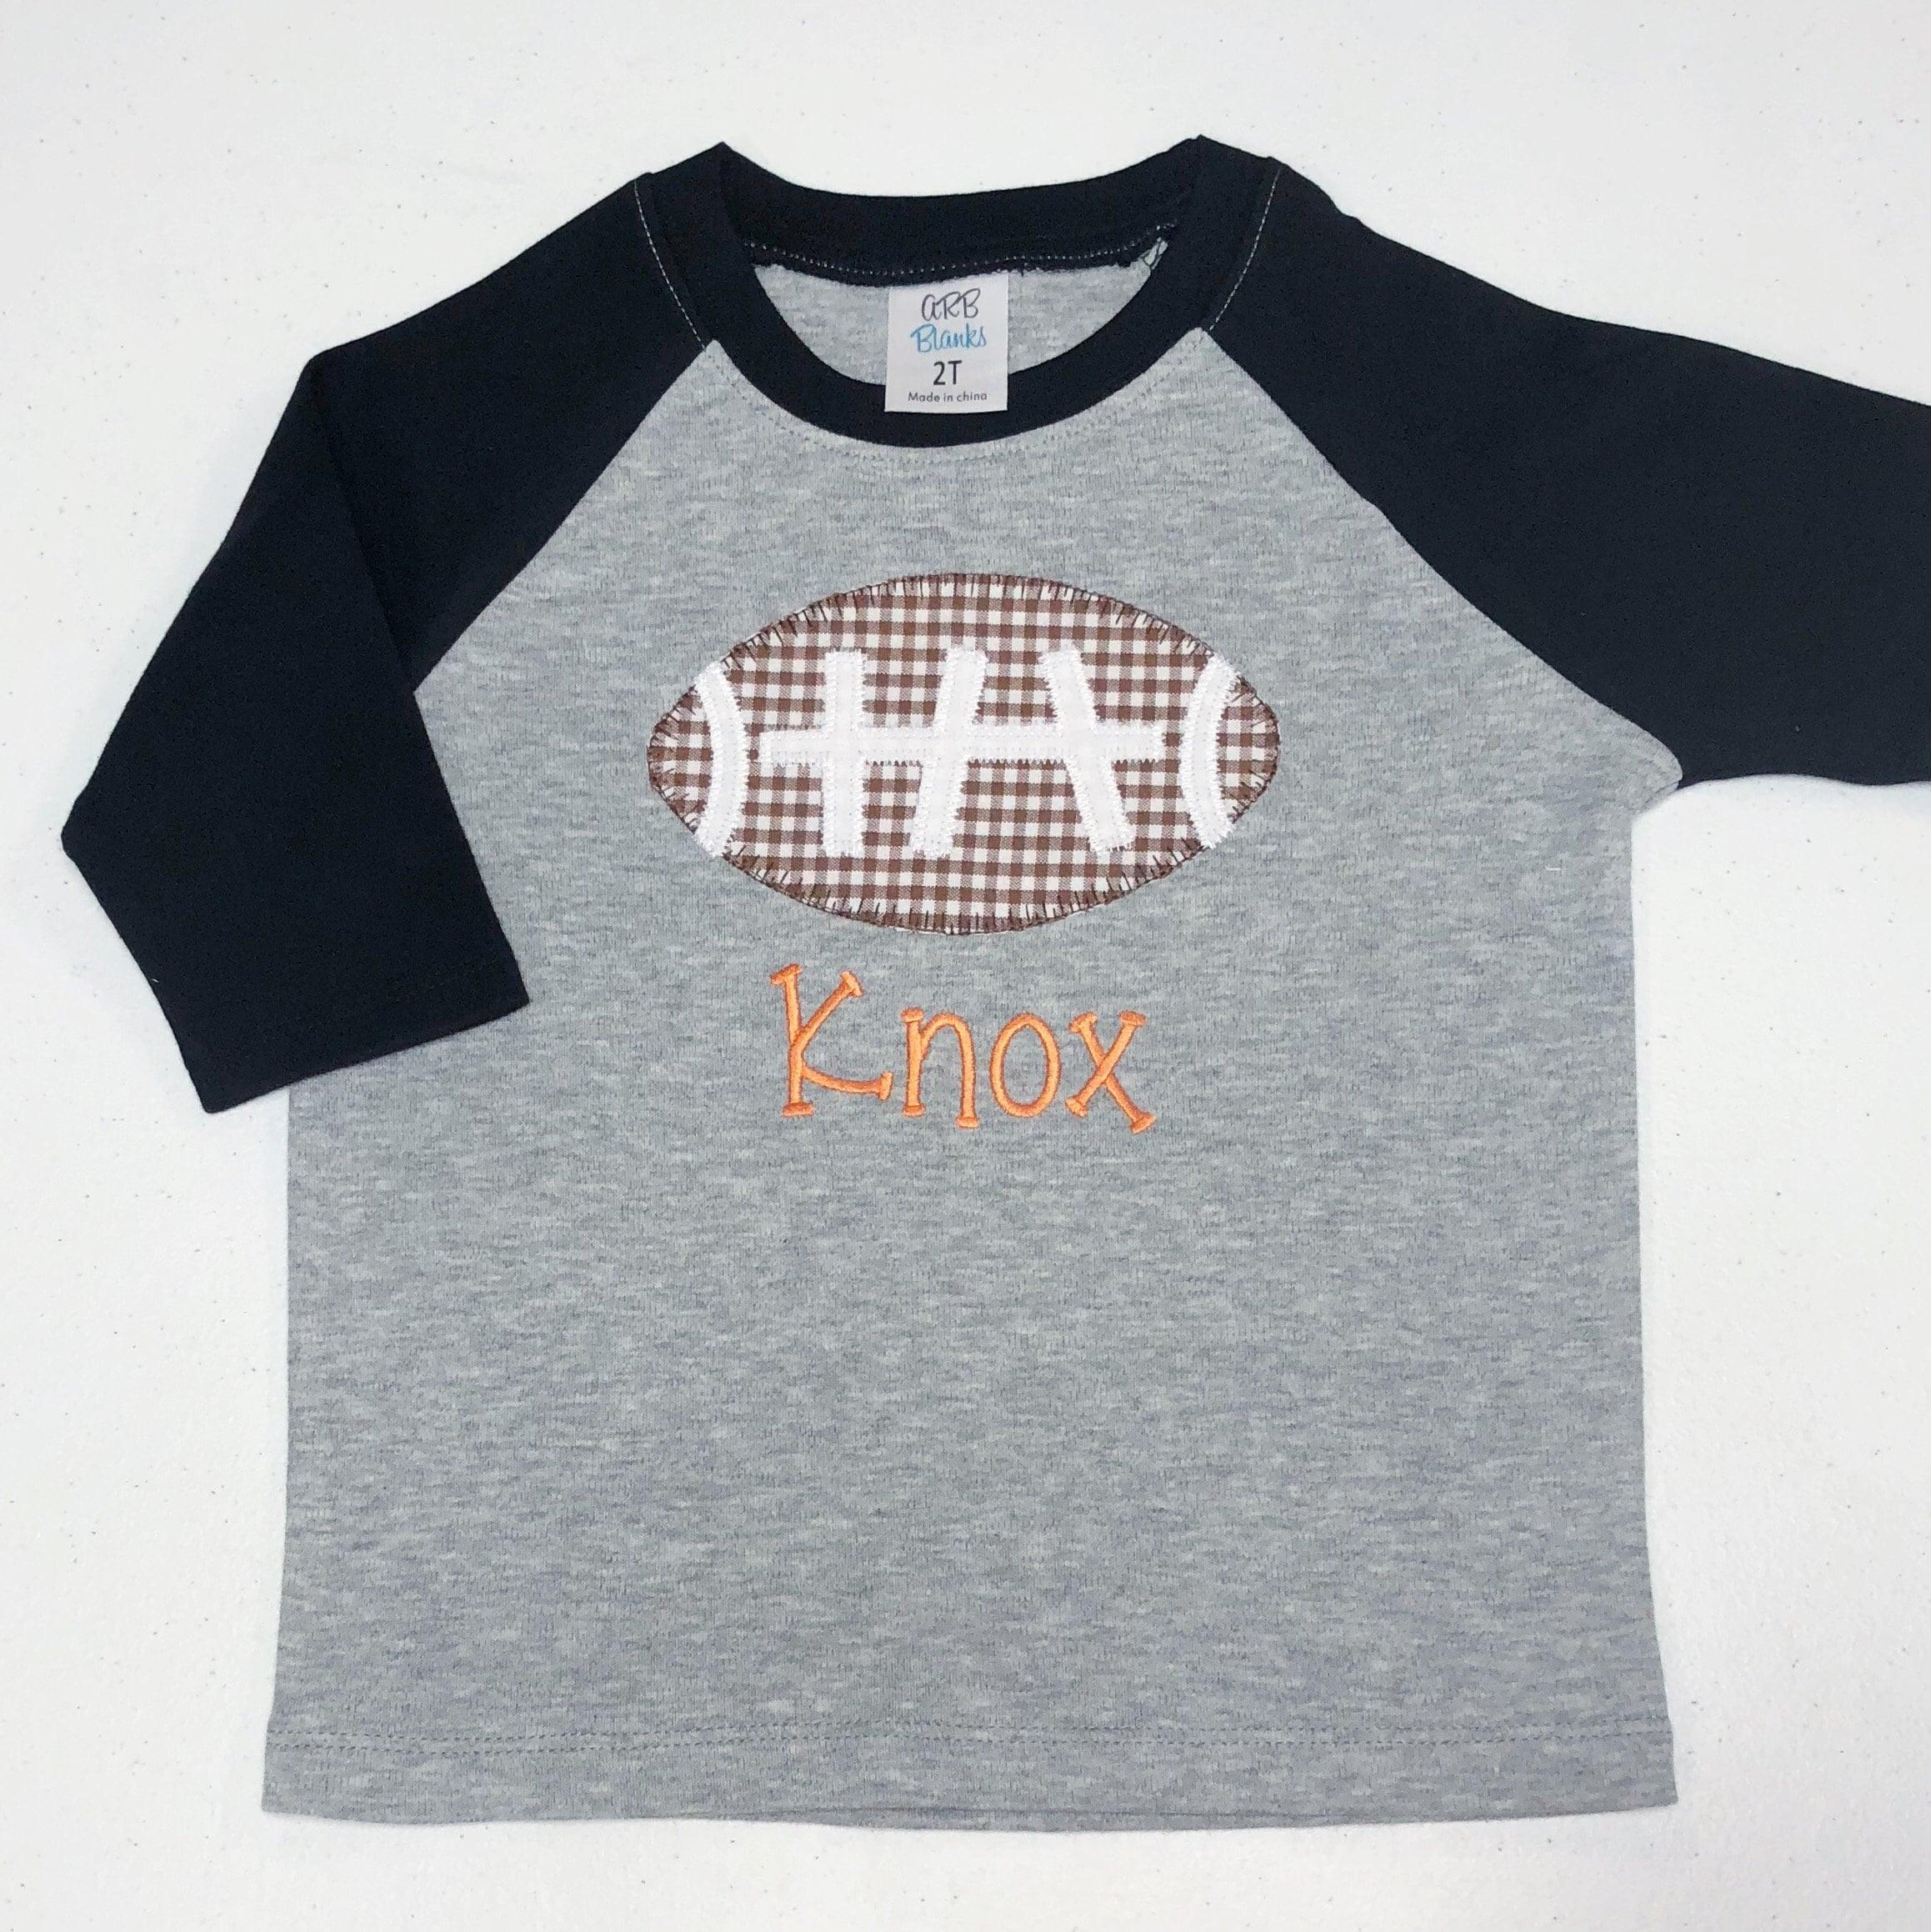 promo code 4e4eb 3ea0d Cheap Bulk Replica Football Shirts